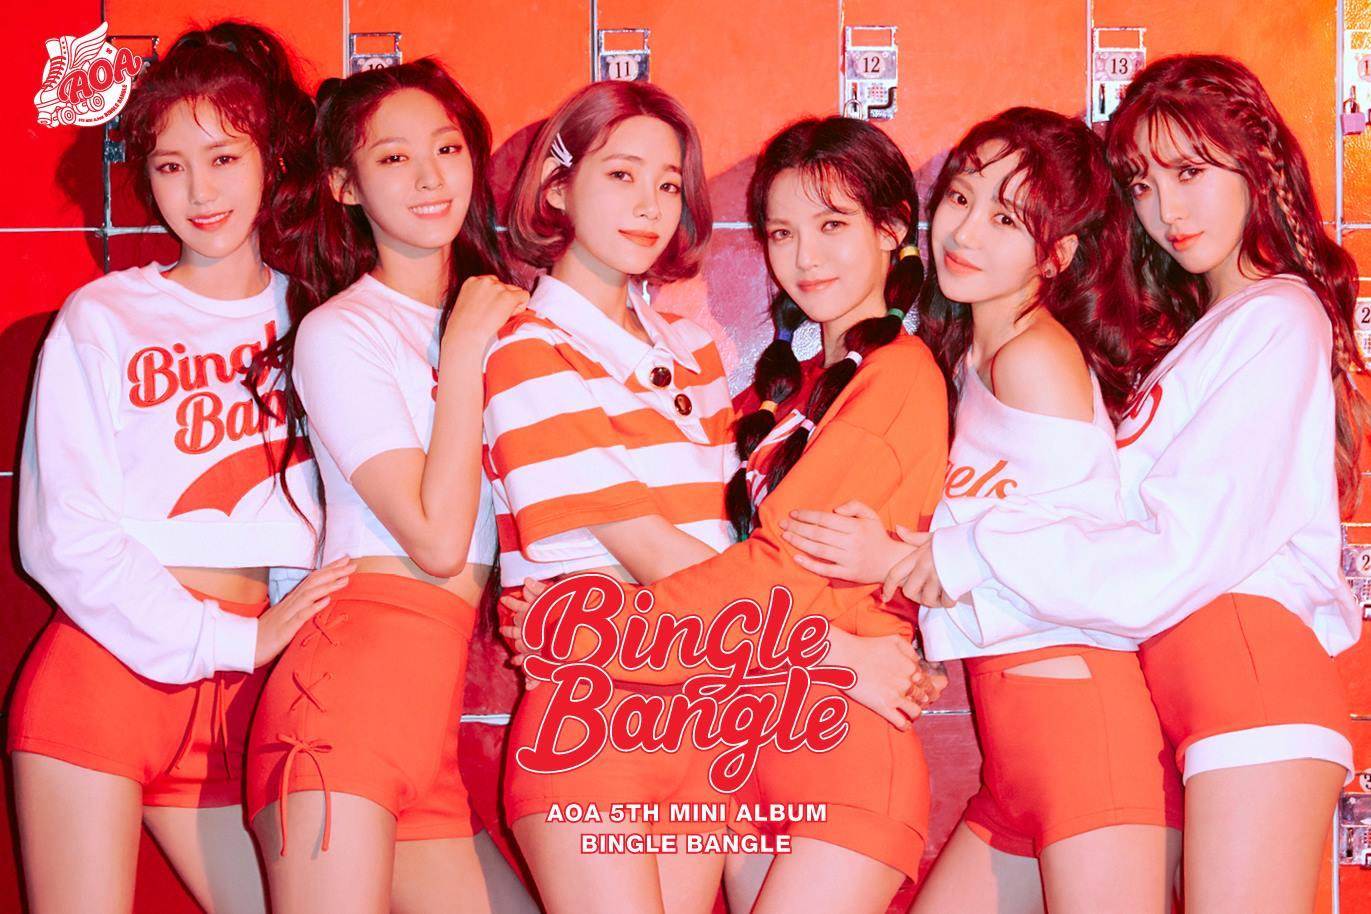 Cherry Bullet 也是 FNC 繼2012年推出女團 AOA後,睽違六年再次推出新女團,讓粉絲都感到相當期待